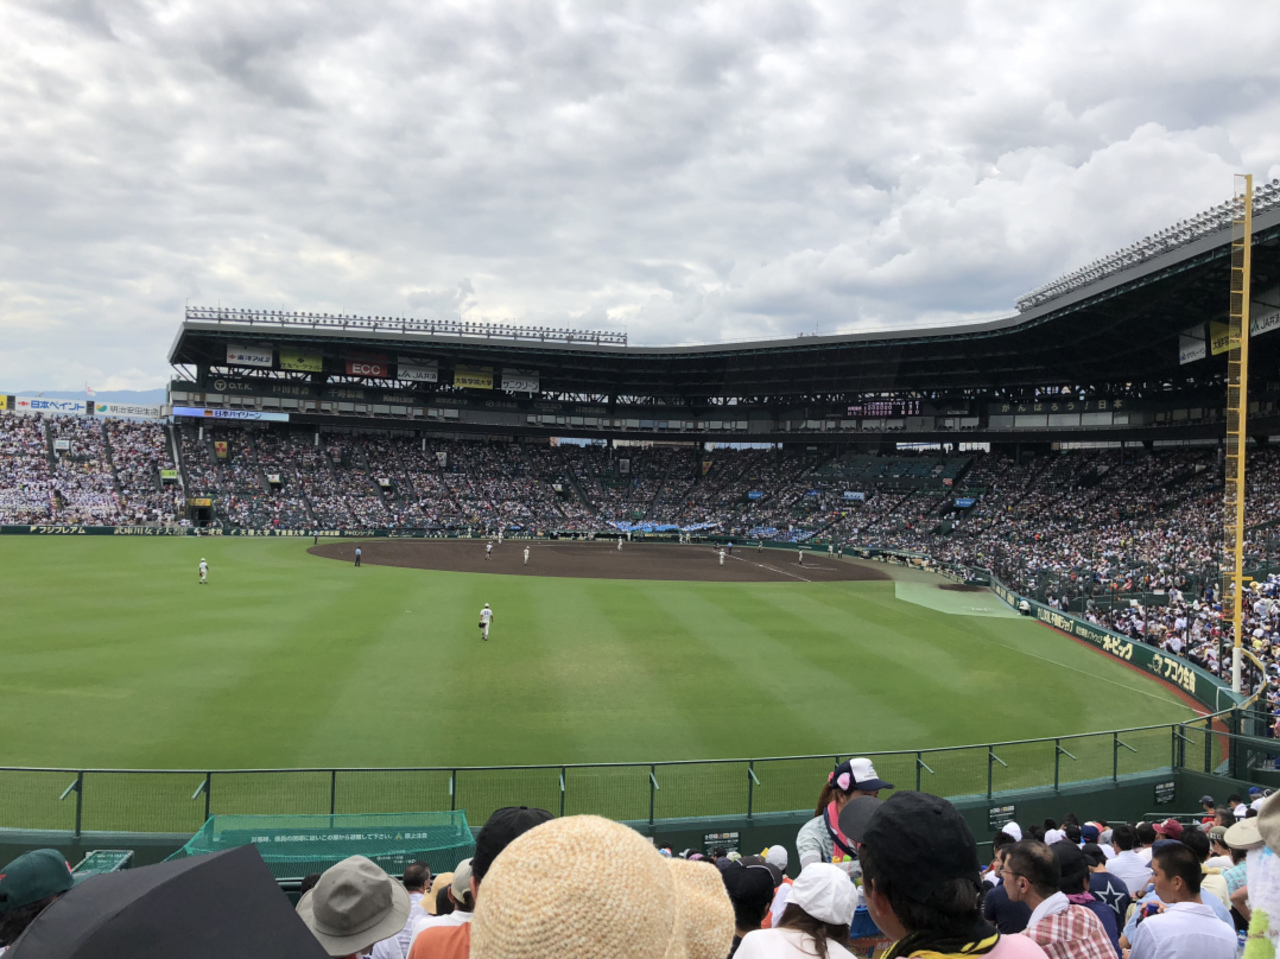 初野球観戦!初甲子園へ!!!